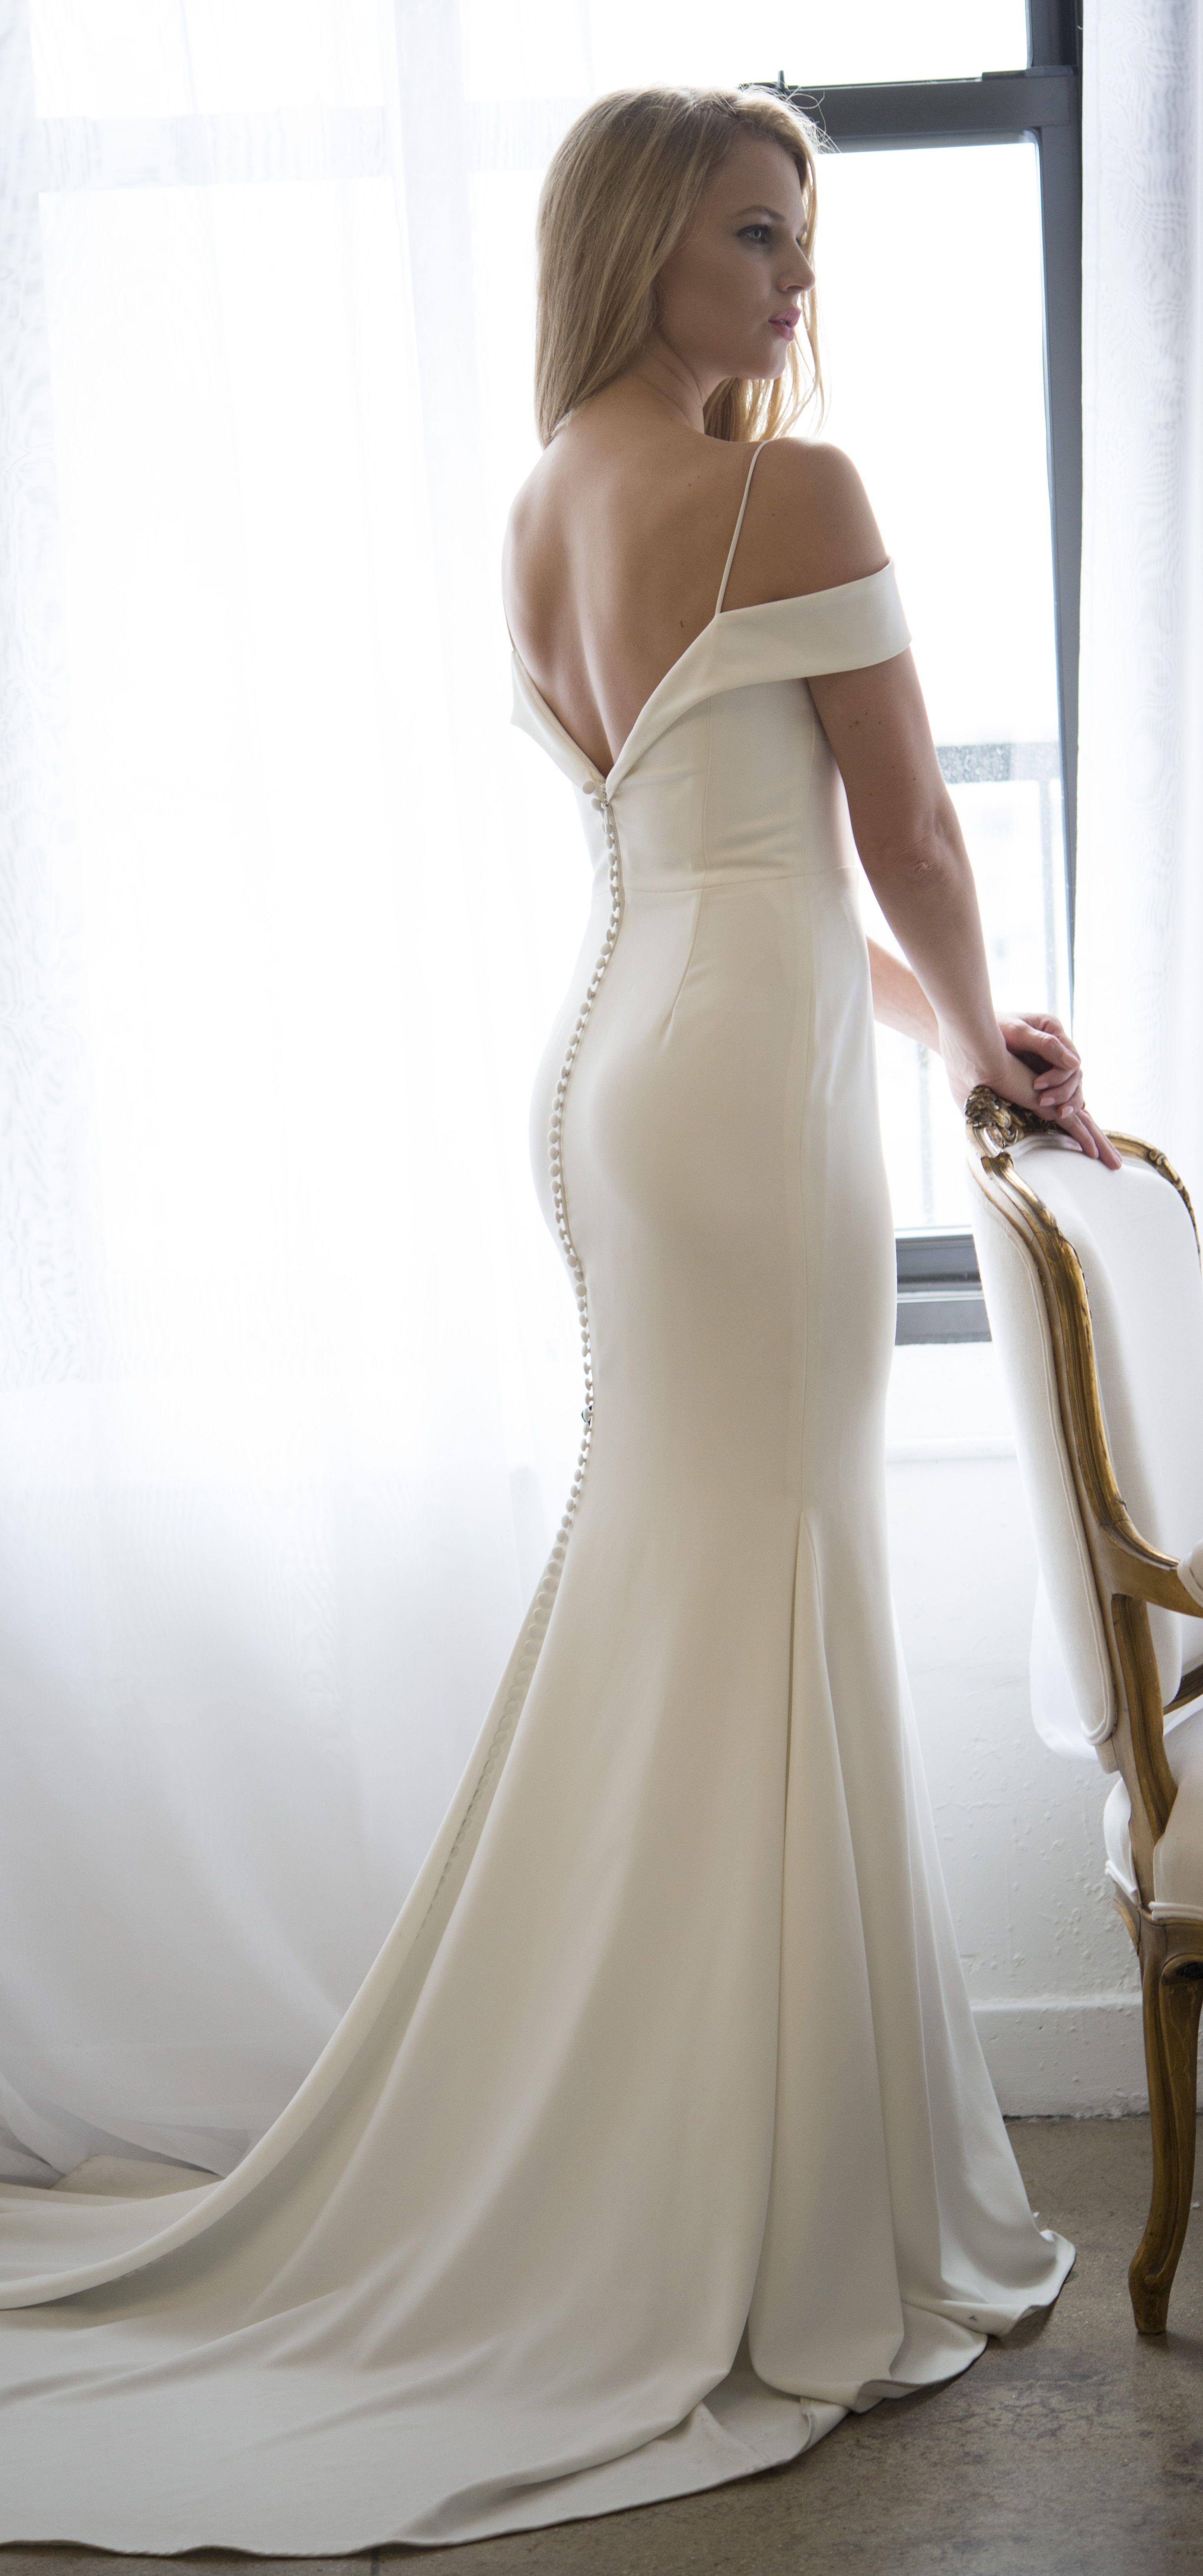 Kelly Faetanini Phoebe Crepe Fabric Wedding Dress Wedding Dresses With Straps Simple Wedding Gowns Trendy Wedding Dresses